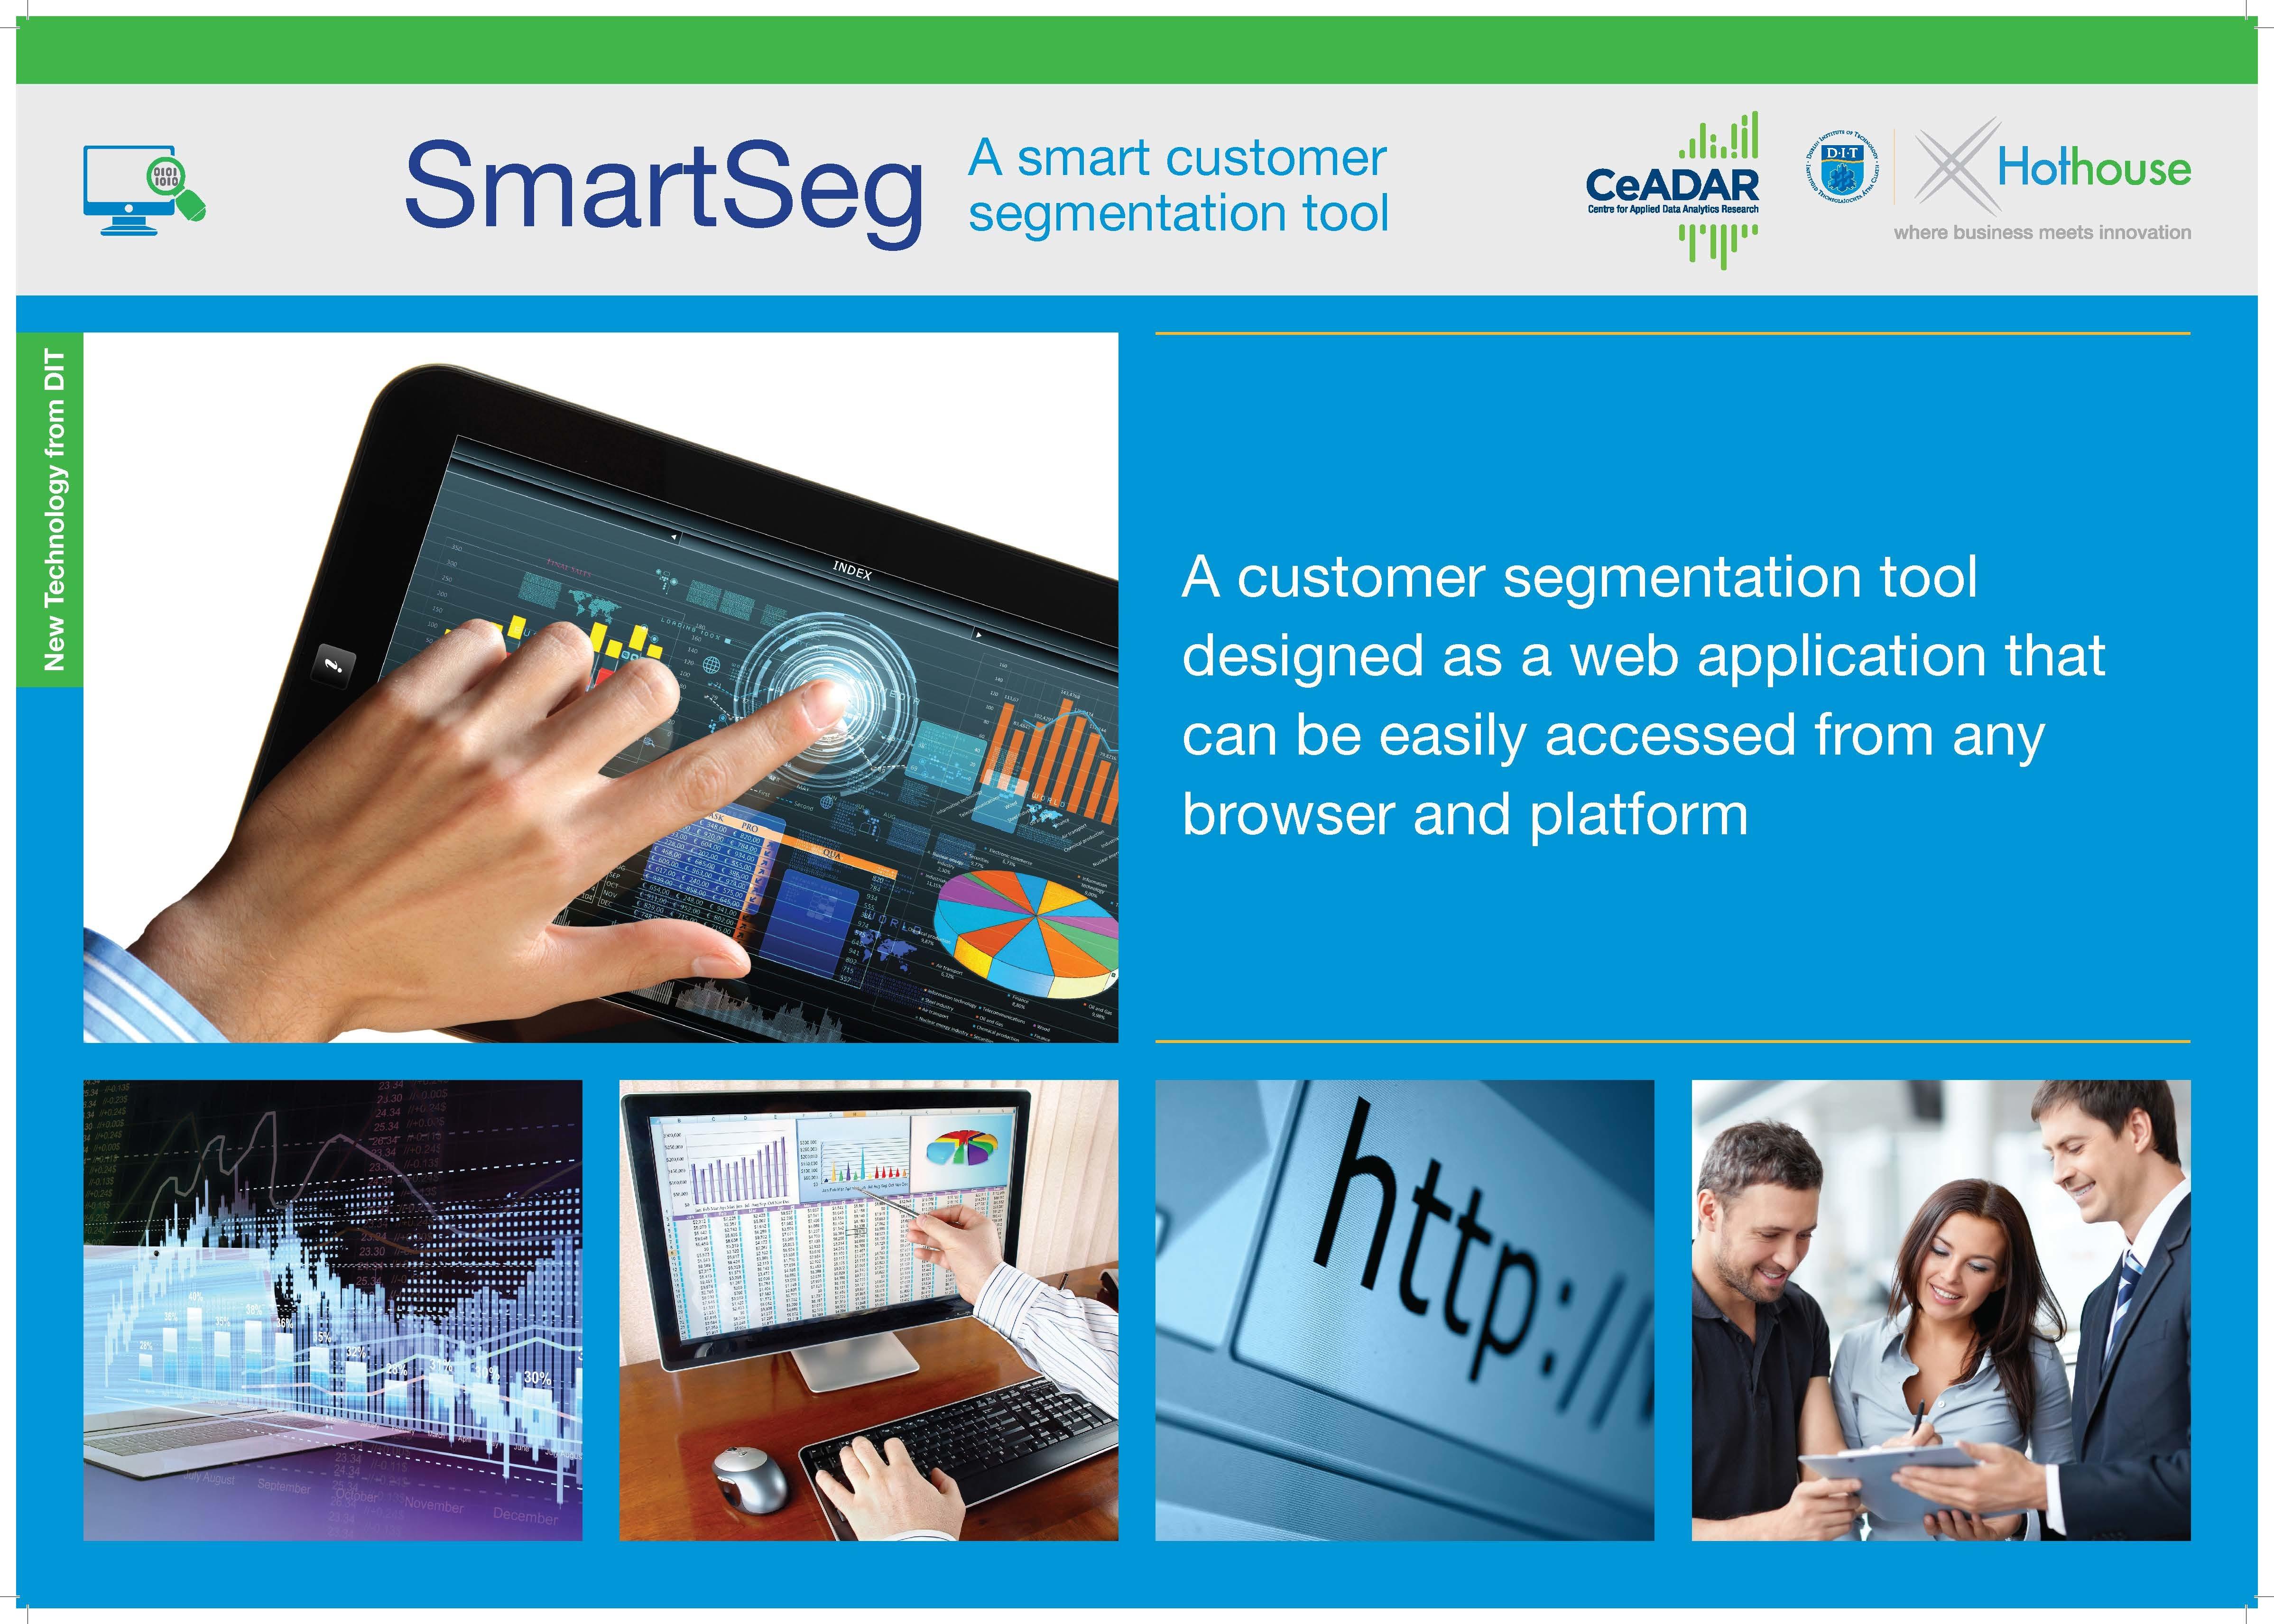 SmartSeg: A Smart Customer Segmentation Tool